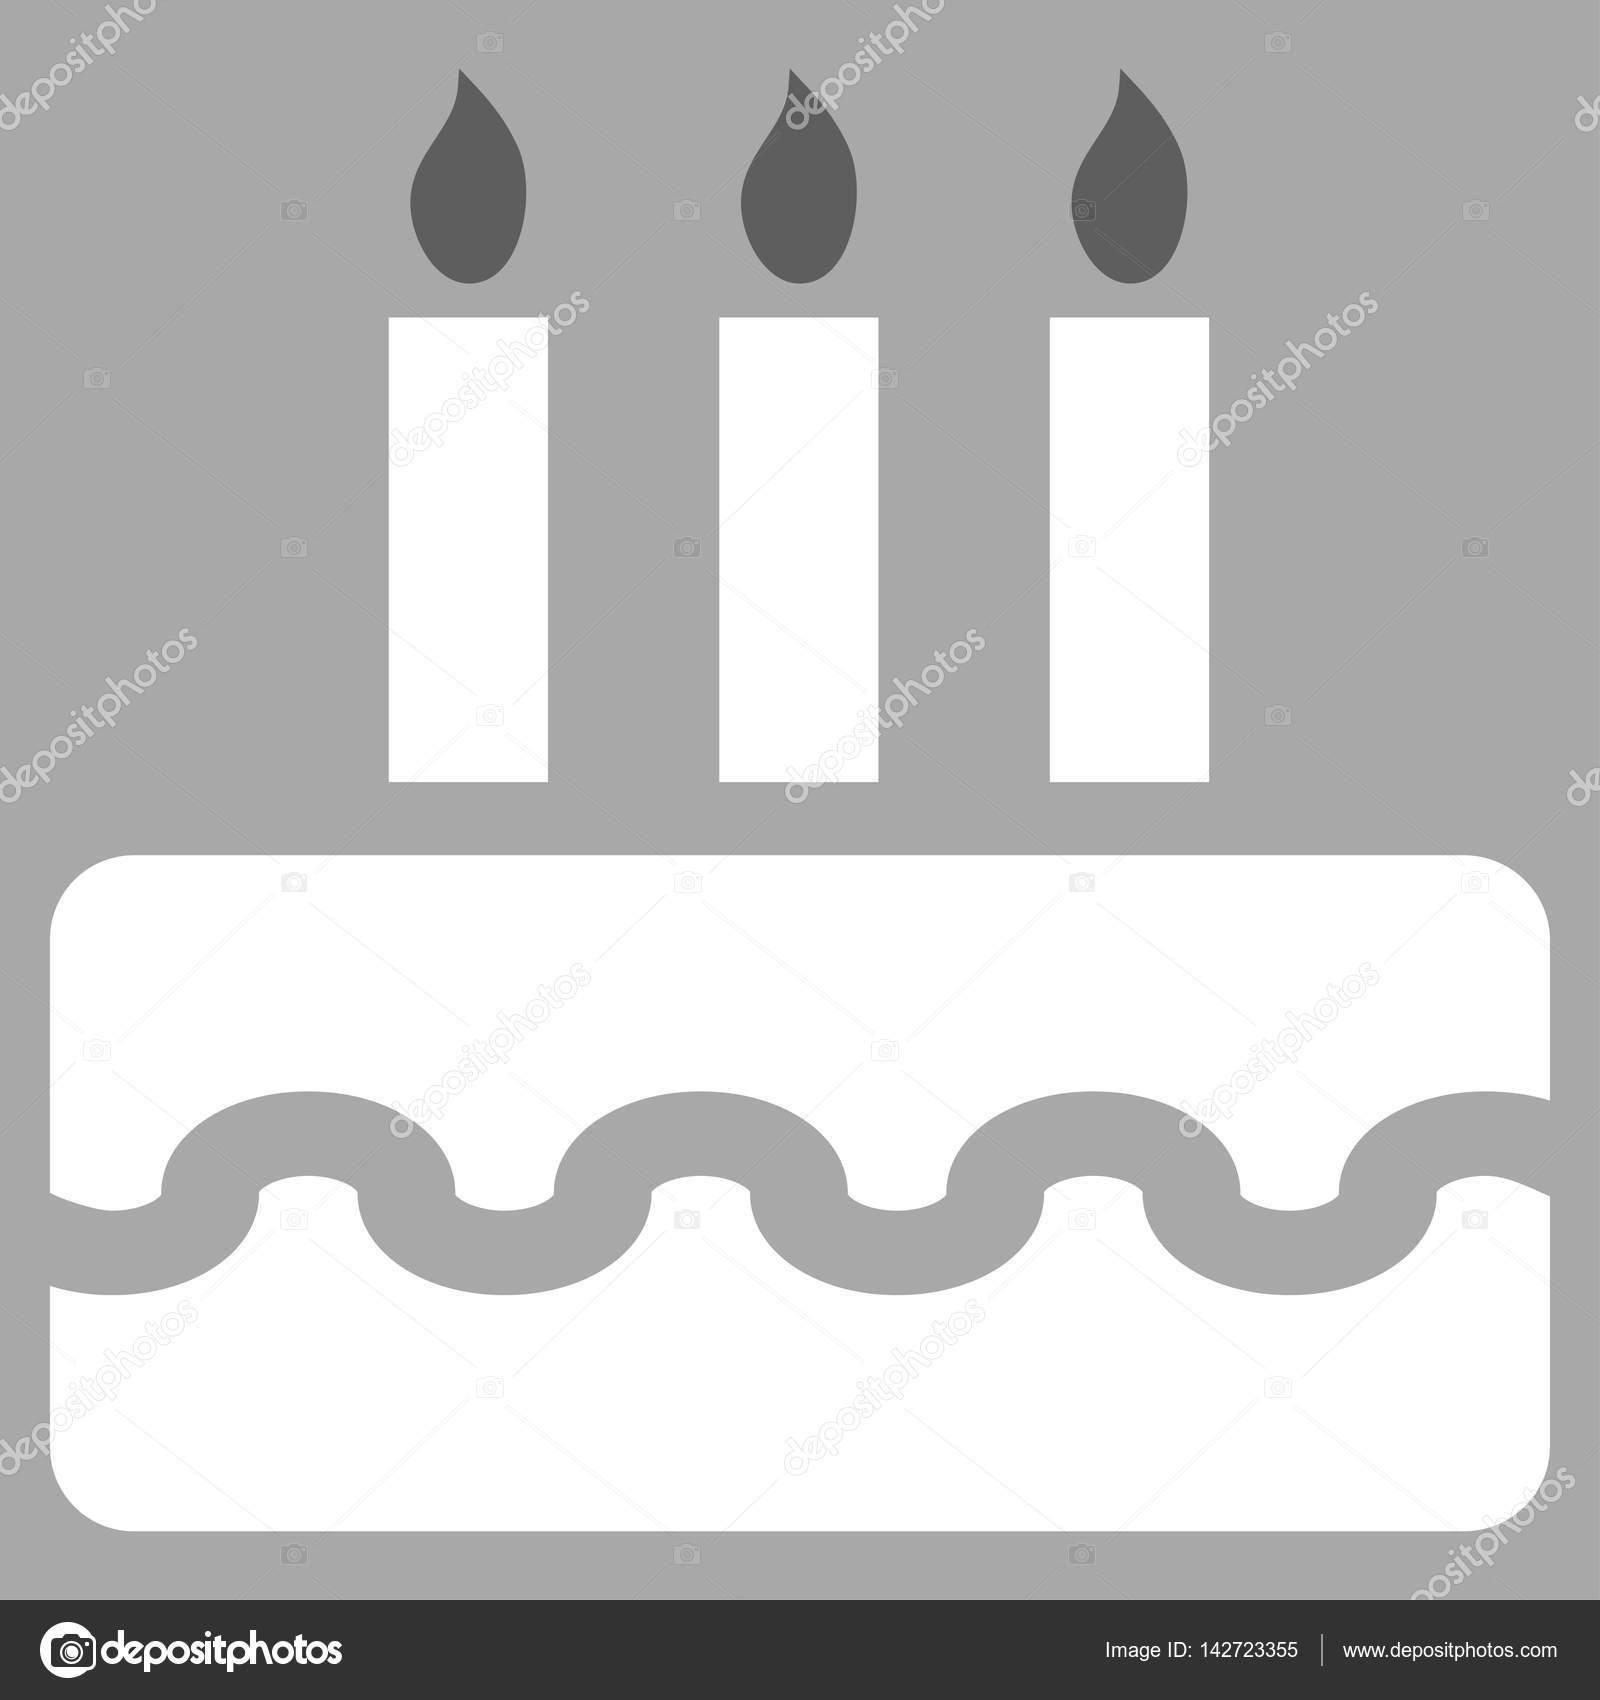 Birthday Cake Vector Icon Stock Vector anastasyastocksgmail